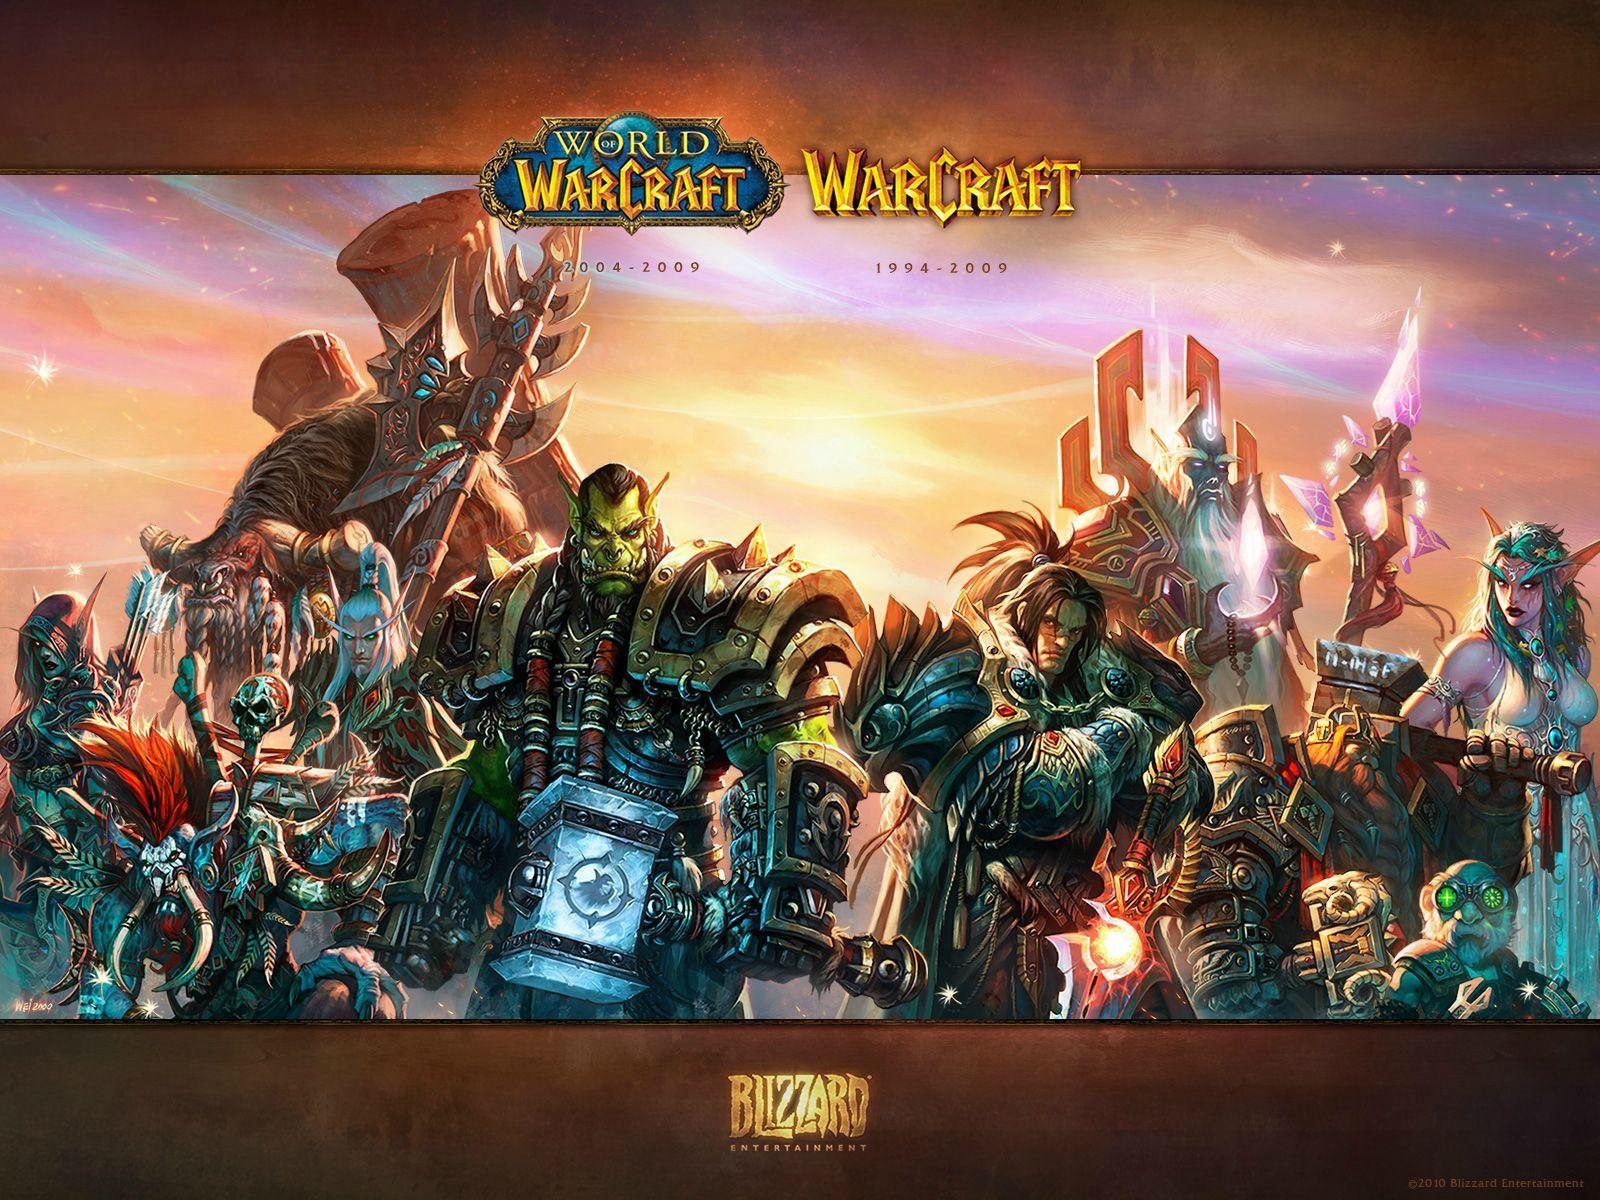 Warcraft Fanart Gallery | Geek, Fandoms, etc. | Pinterest